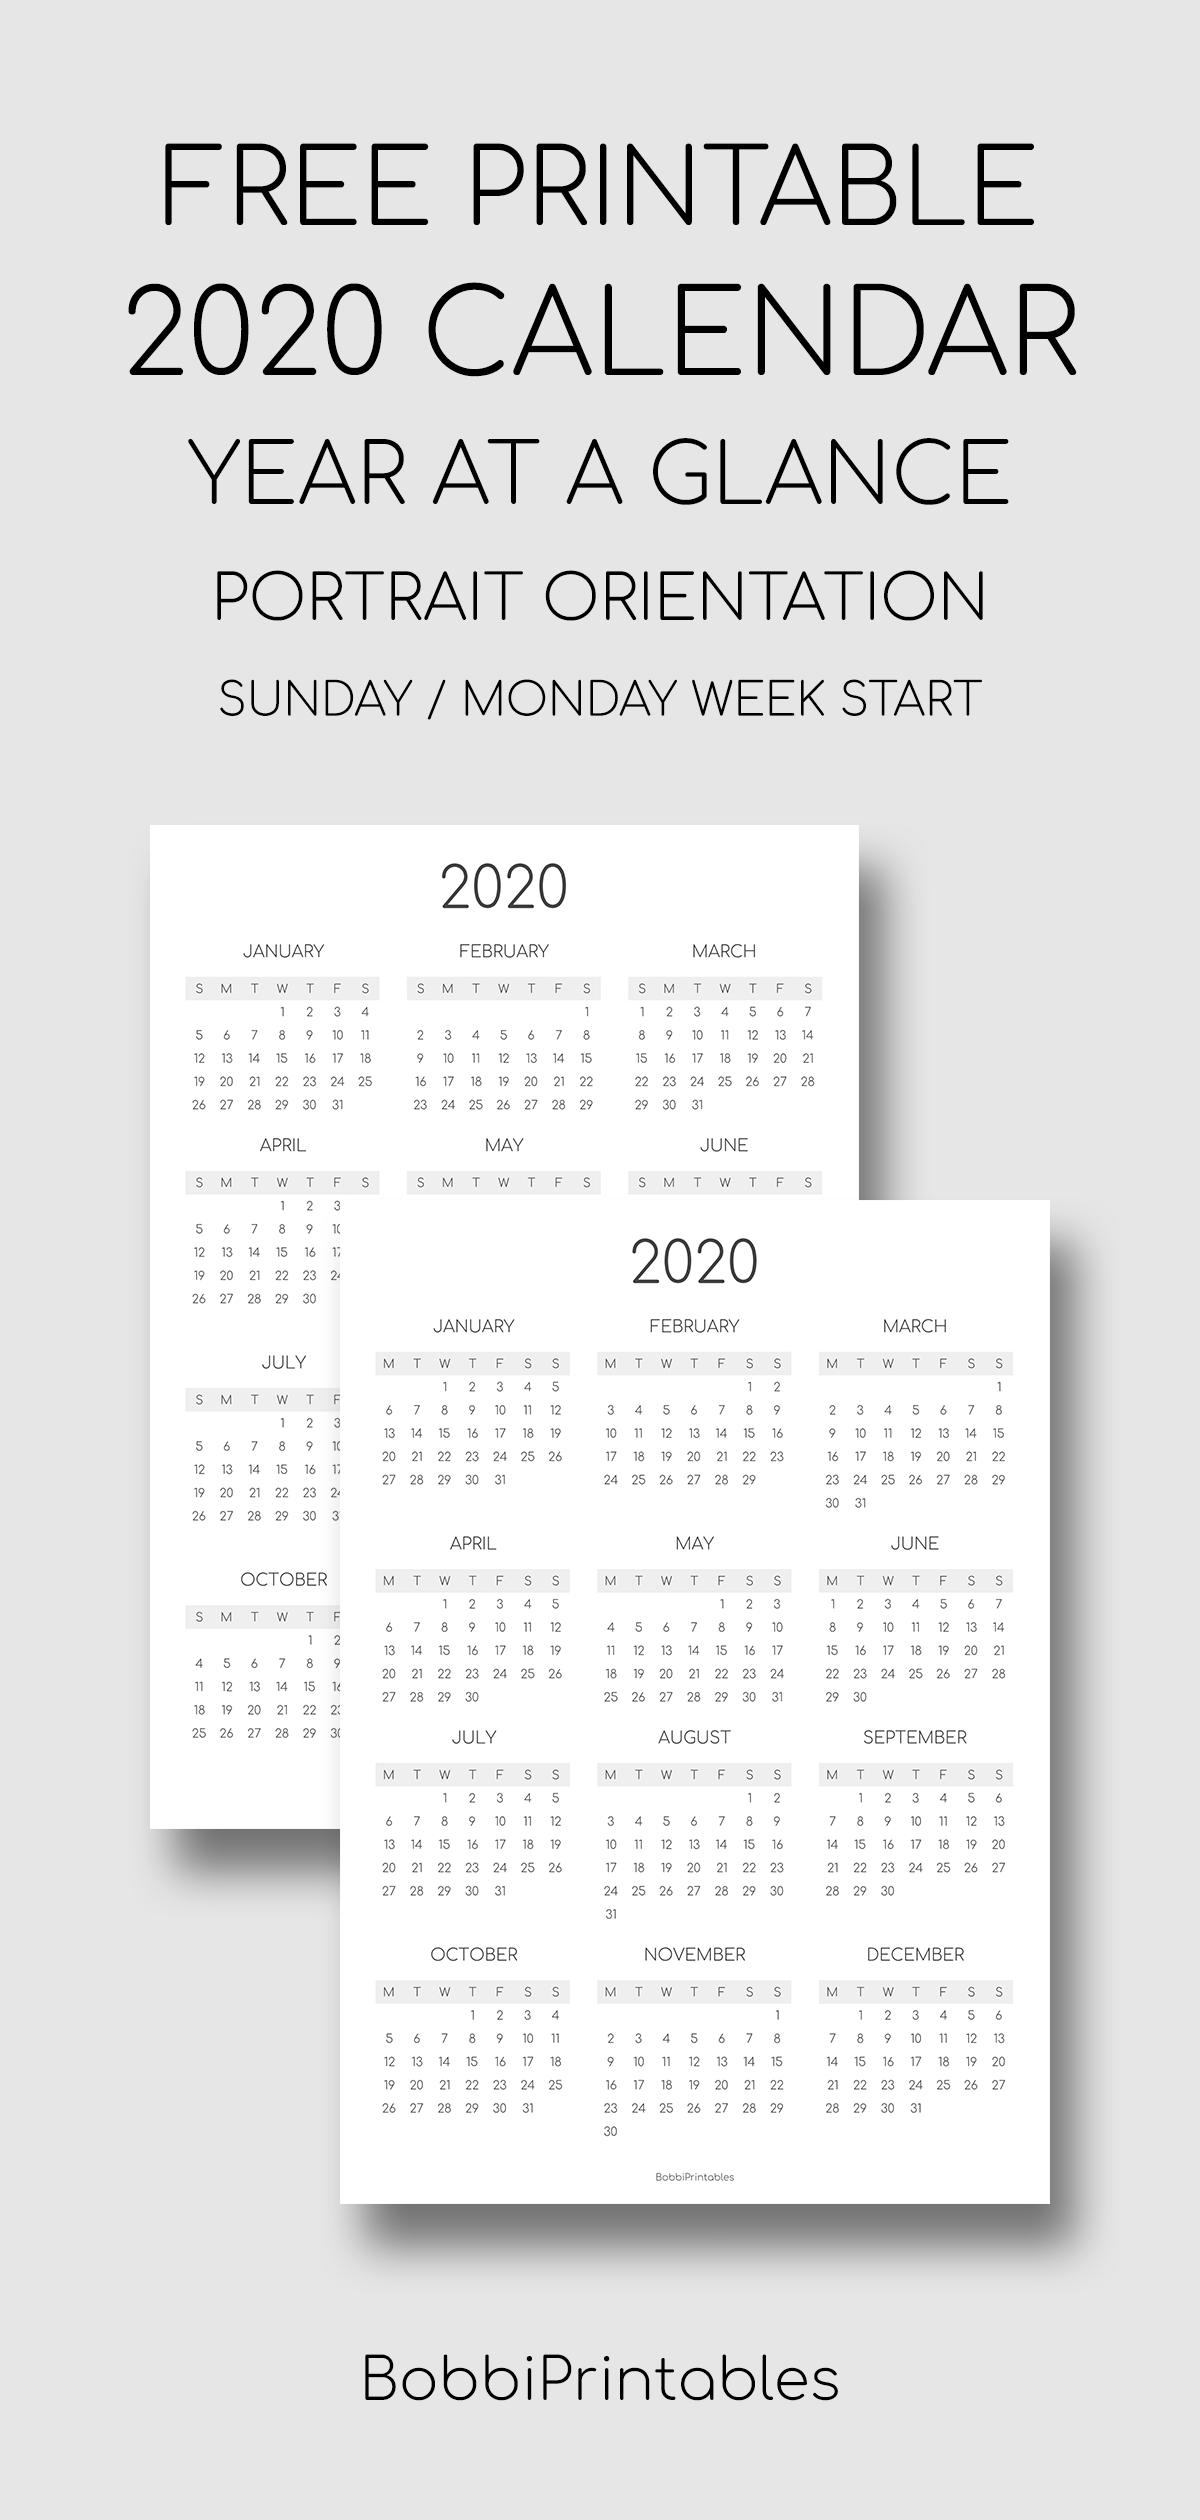 Printable 2020 Year At A Glance Calendar - Portrait inside At A Glance 2020 Calendar Year Free Printable